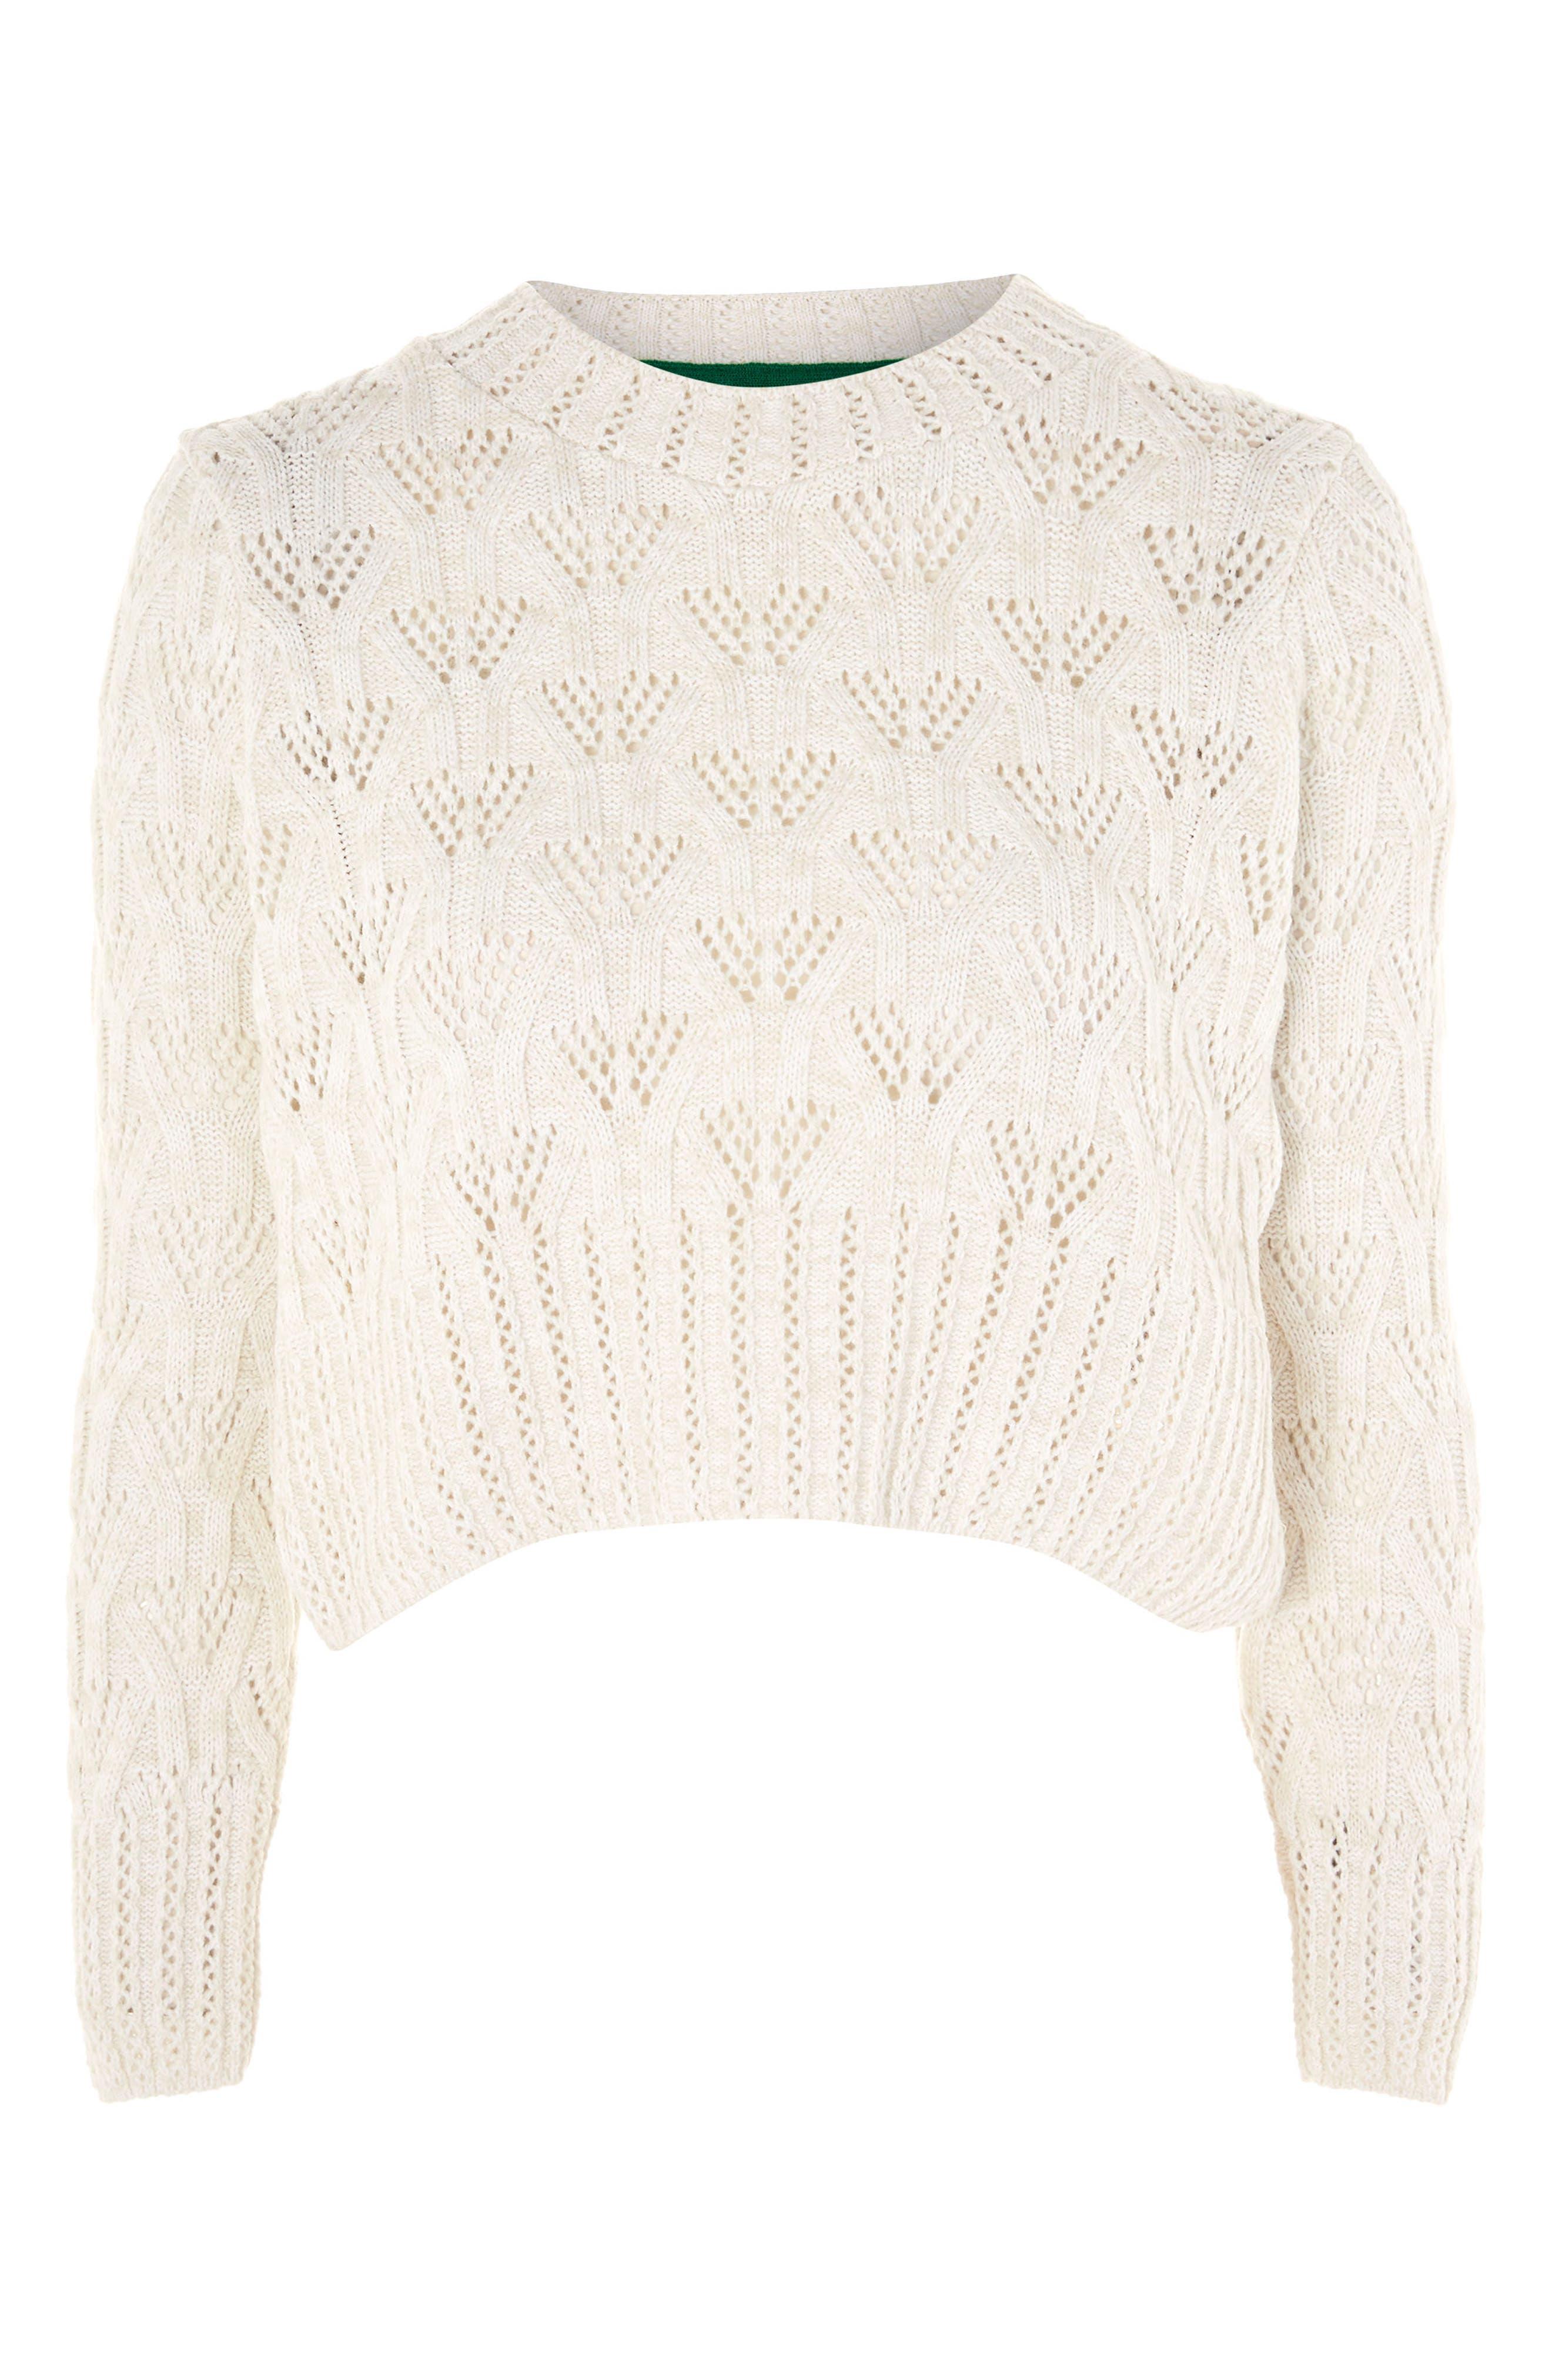 Geo Stitch Sweater,                             Alternate thumbnail 3, color,                             900